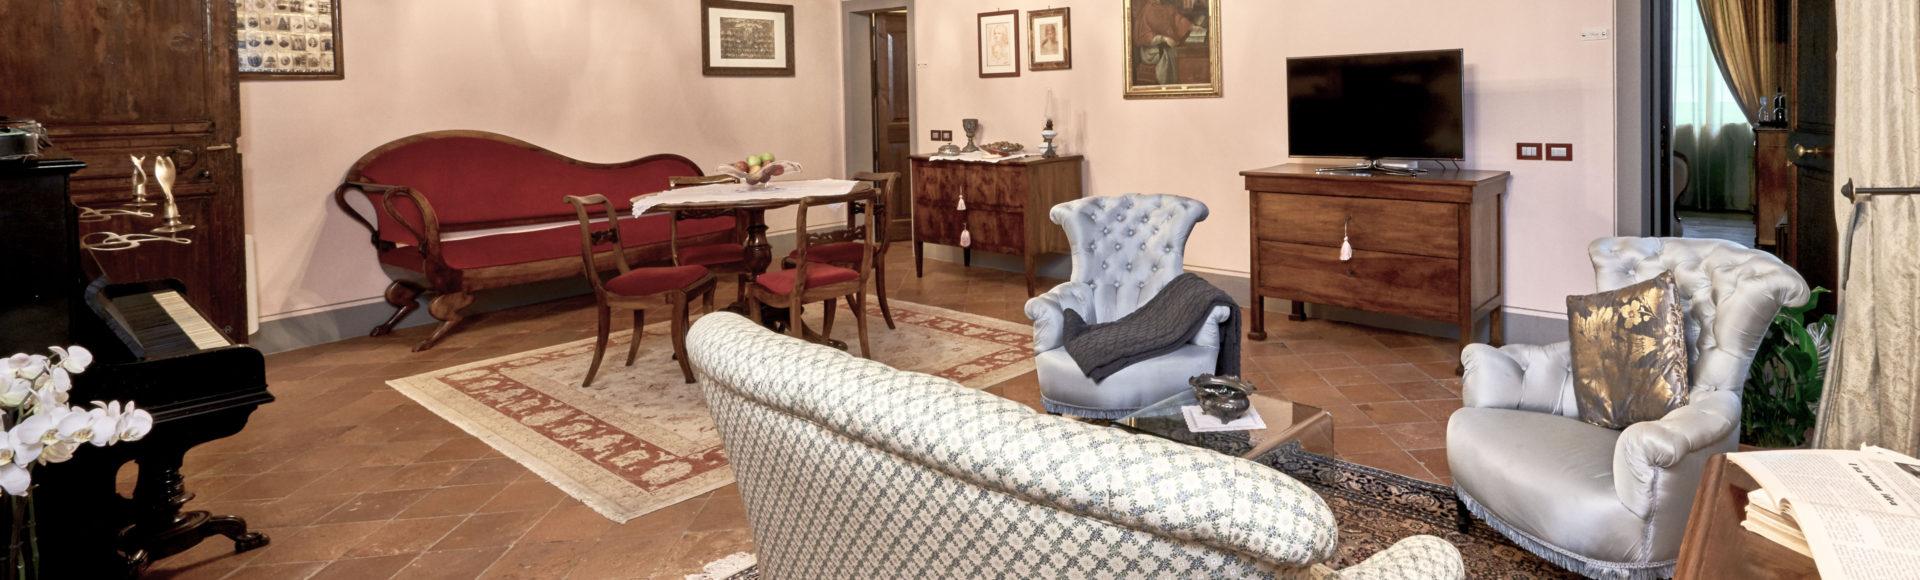 tosco-suite-salotto